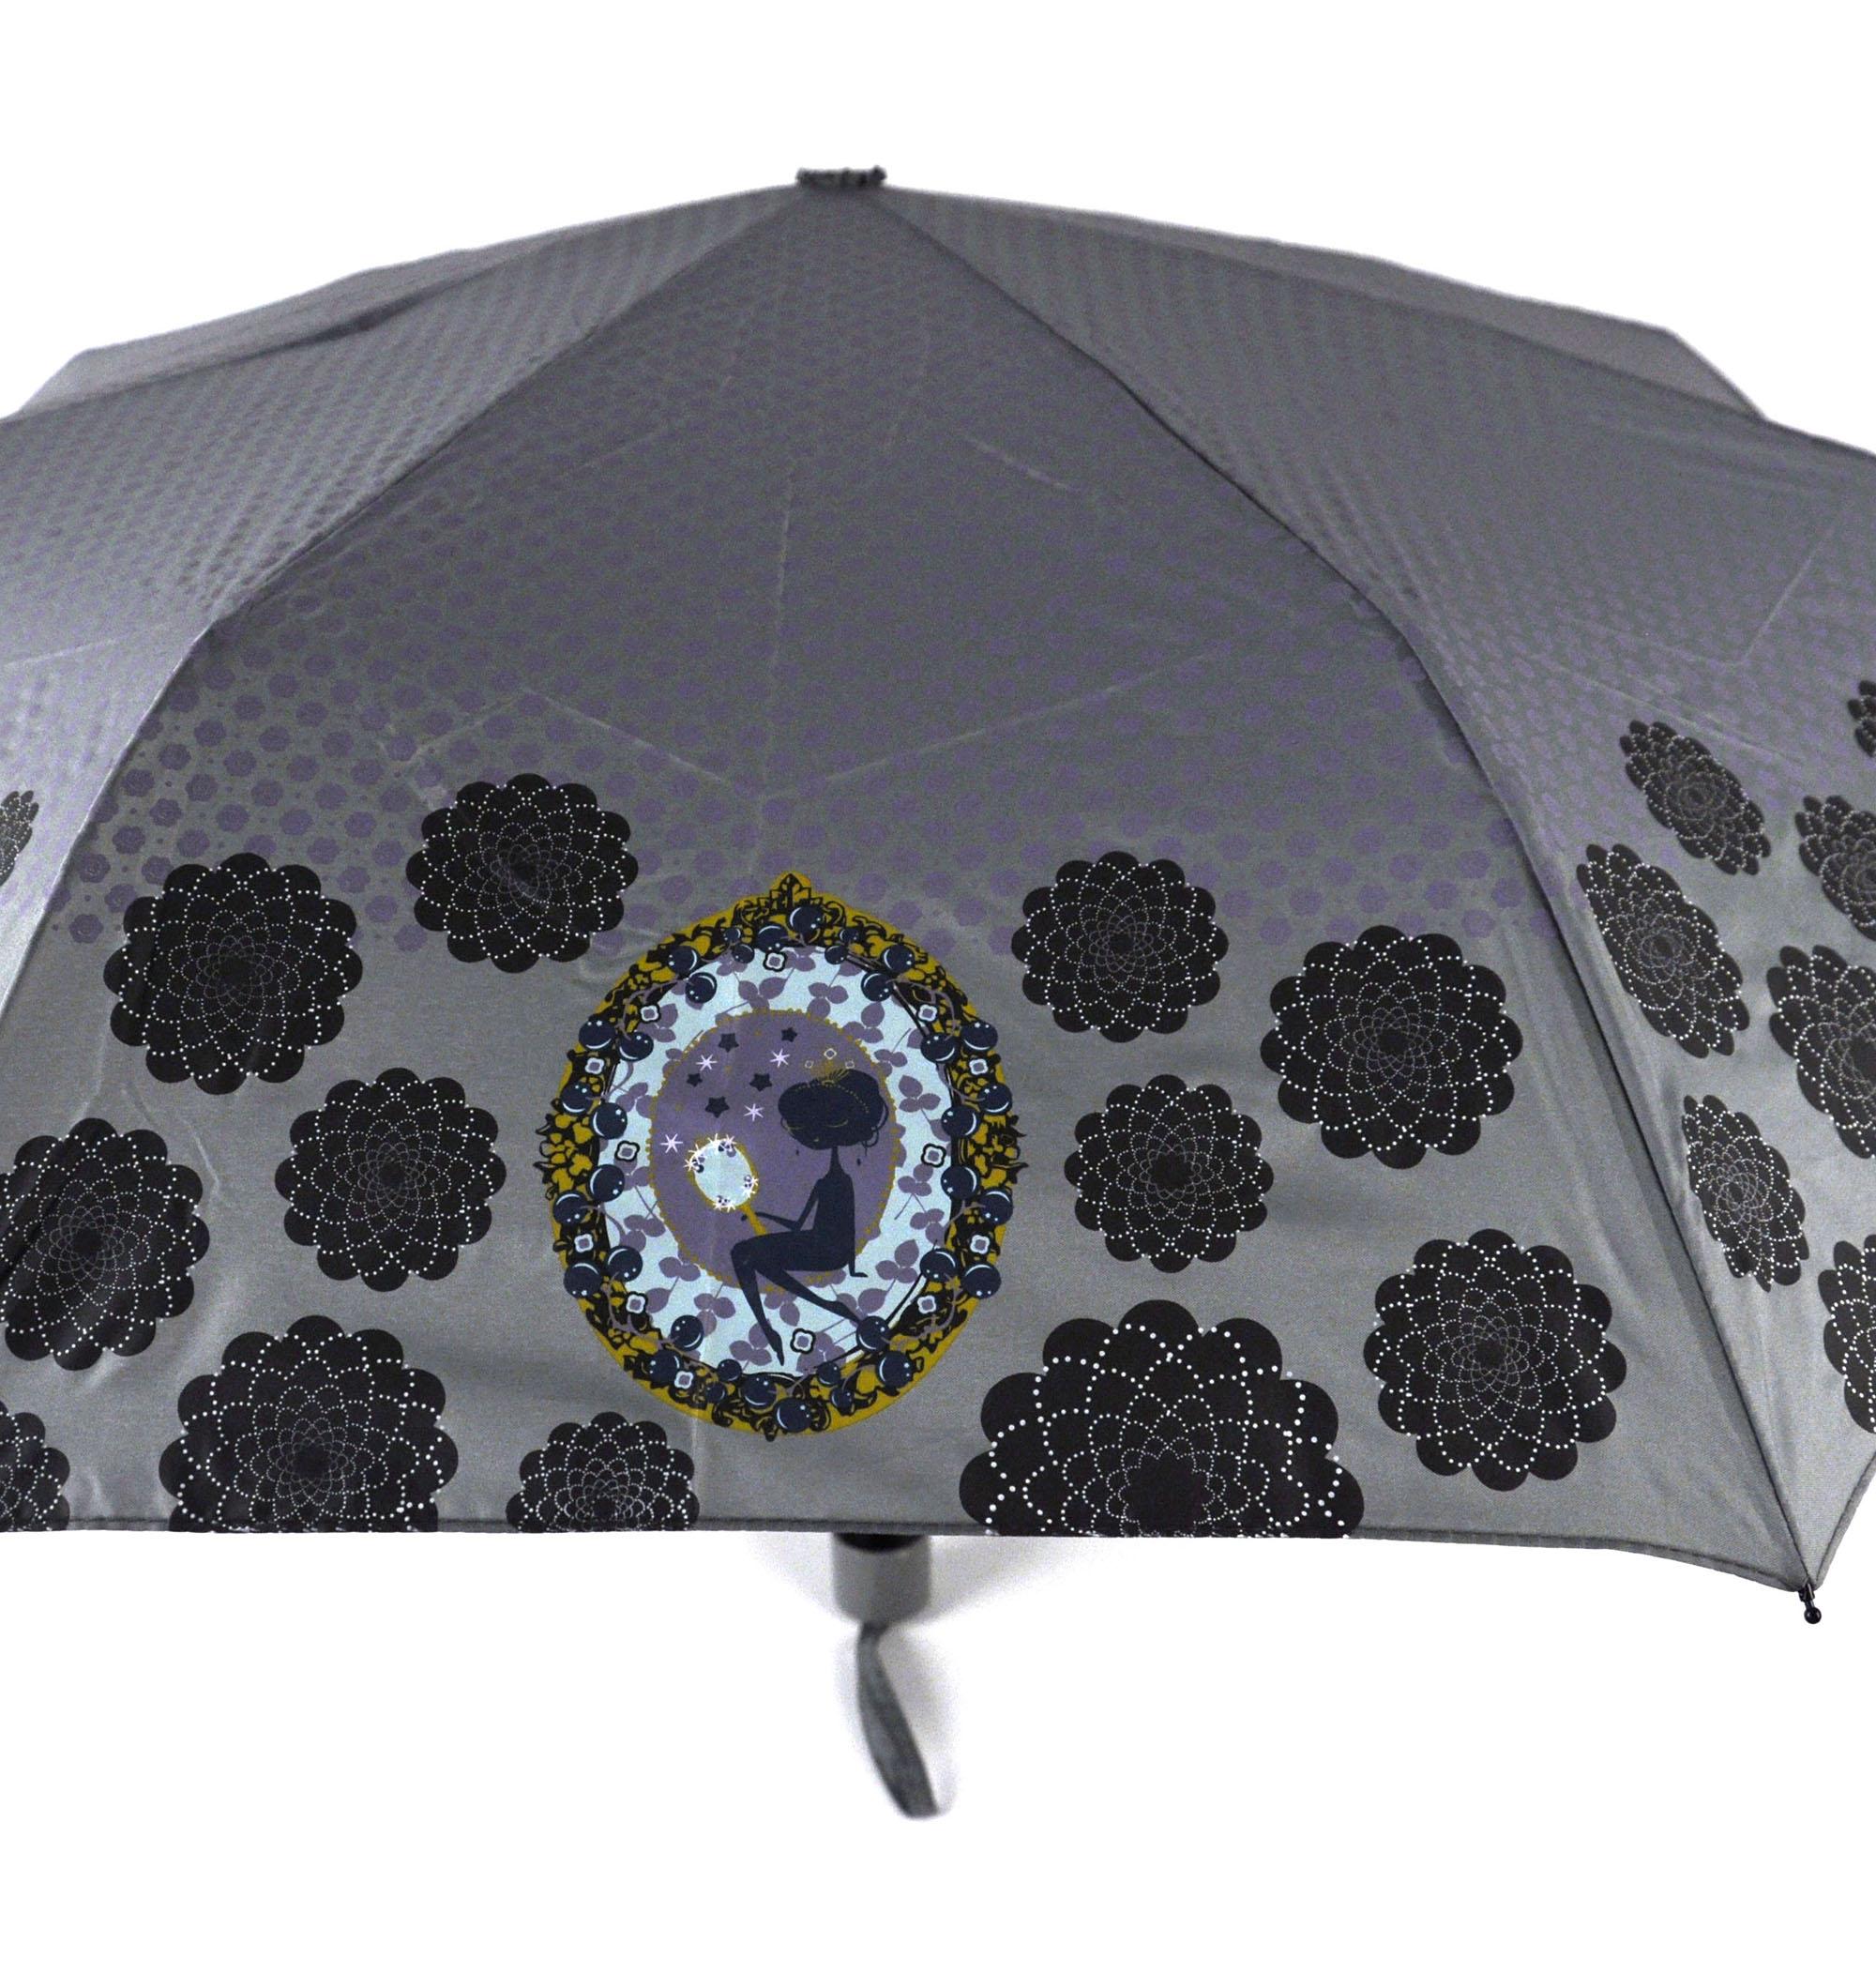 Ladies Deluxe Umbrella Compact Rain Brolly Decodelire Paris Madame Grey Womens